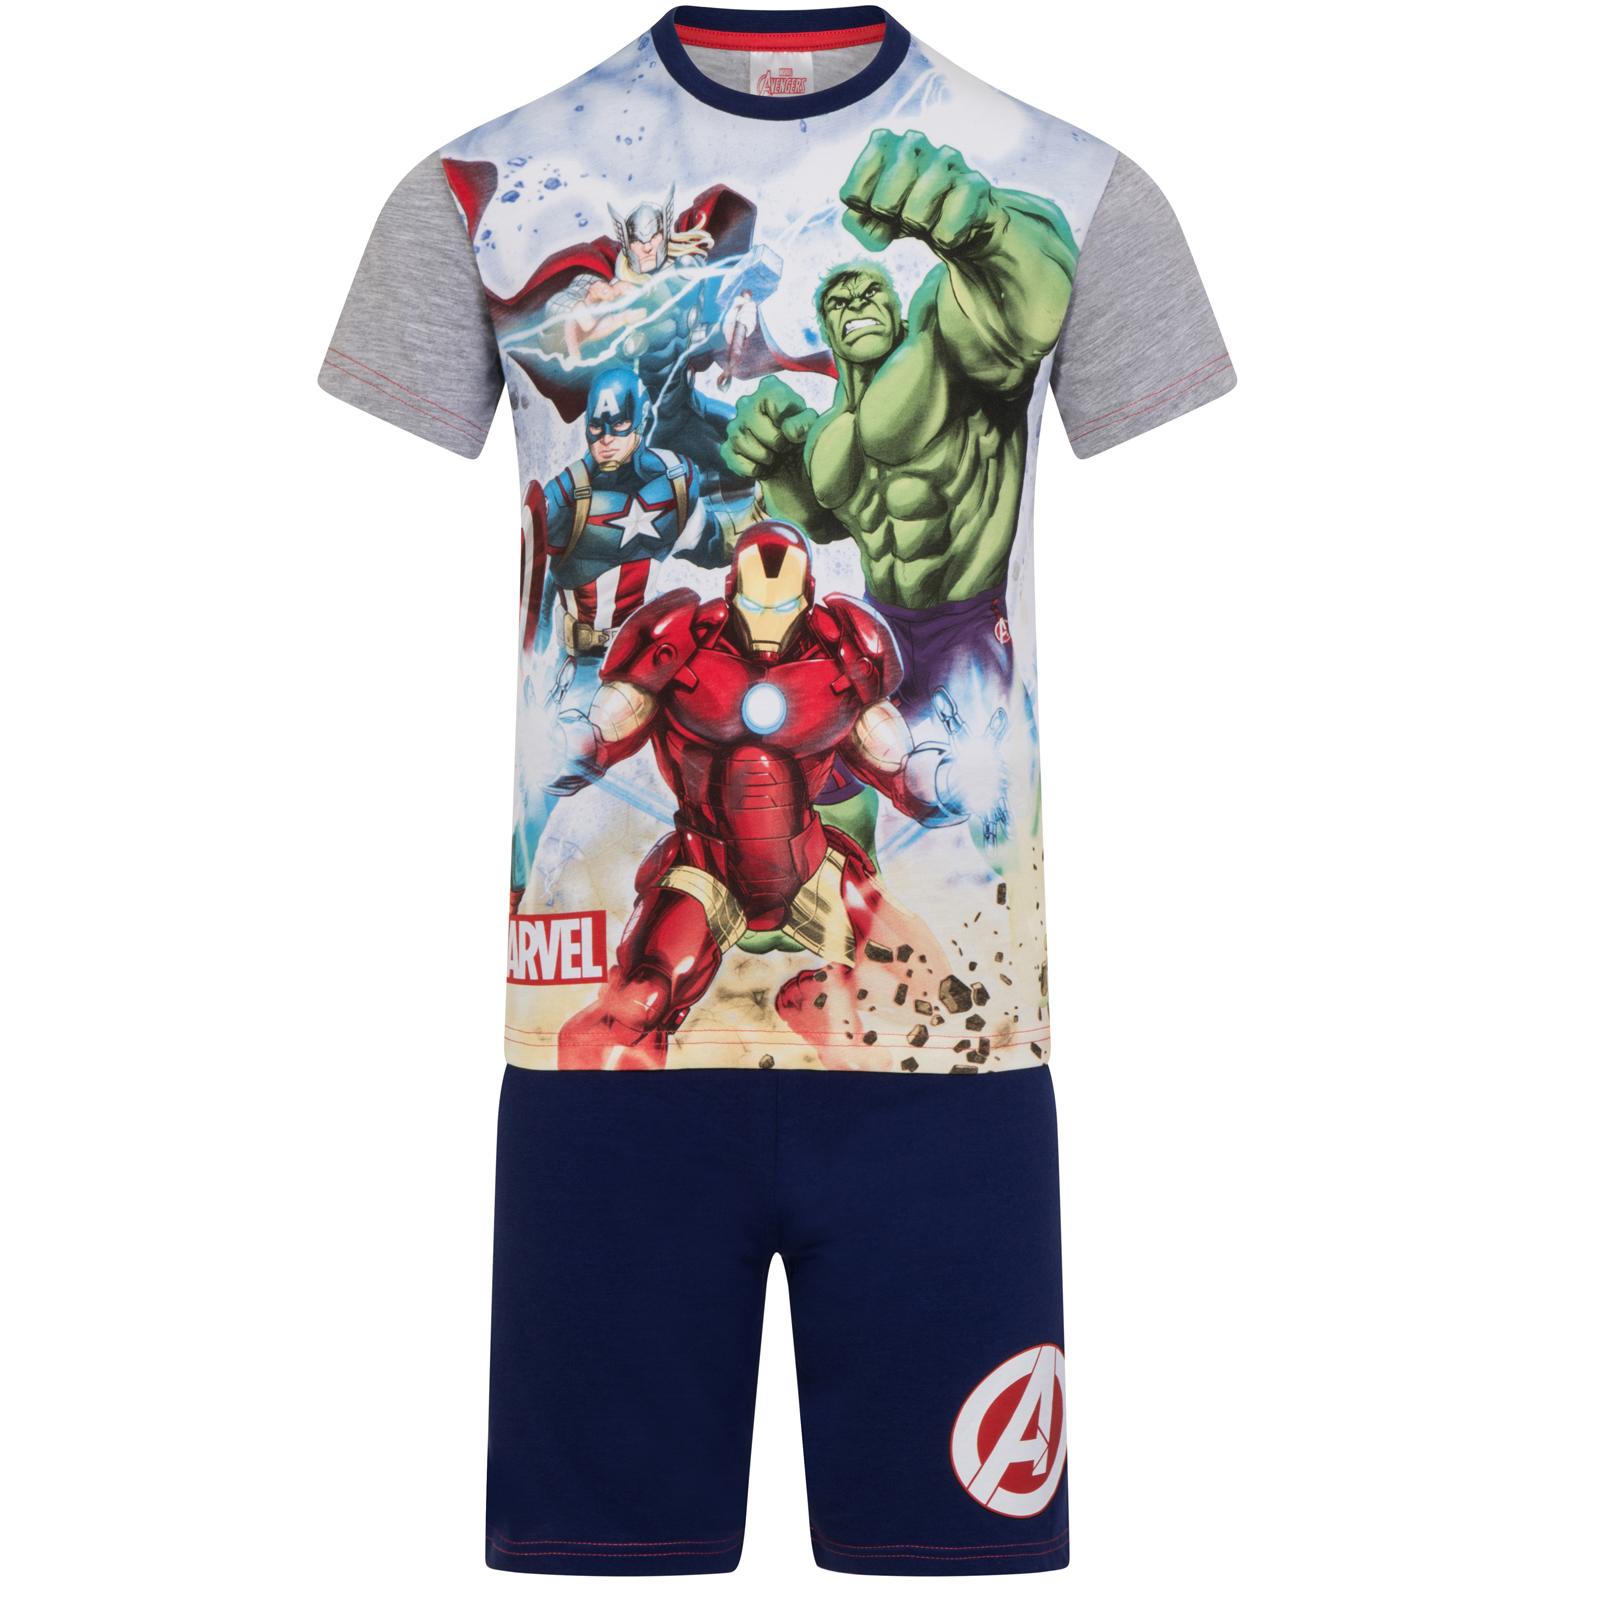 Marvel Avengers Pyjamas with Captain America Iron Man Thor Hulk for Boys